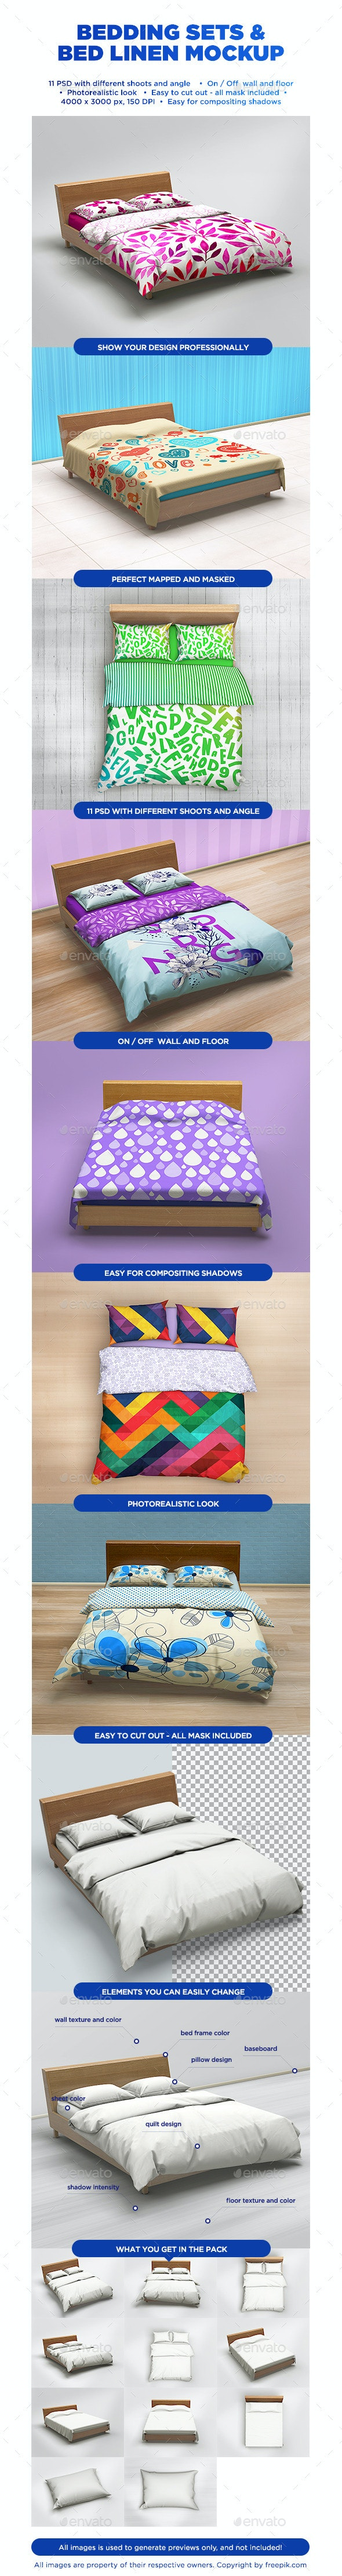 Bedding Sets & Bed Linen Mockup - Miscellaneous Product Mock-Ups